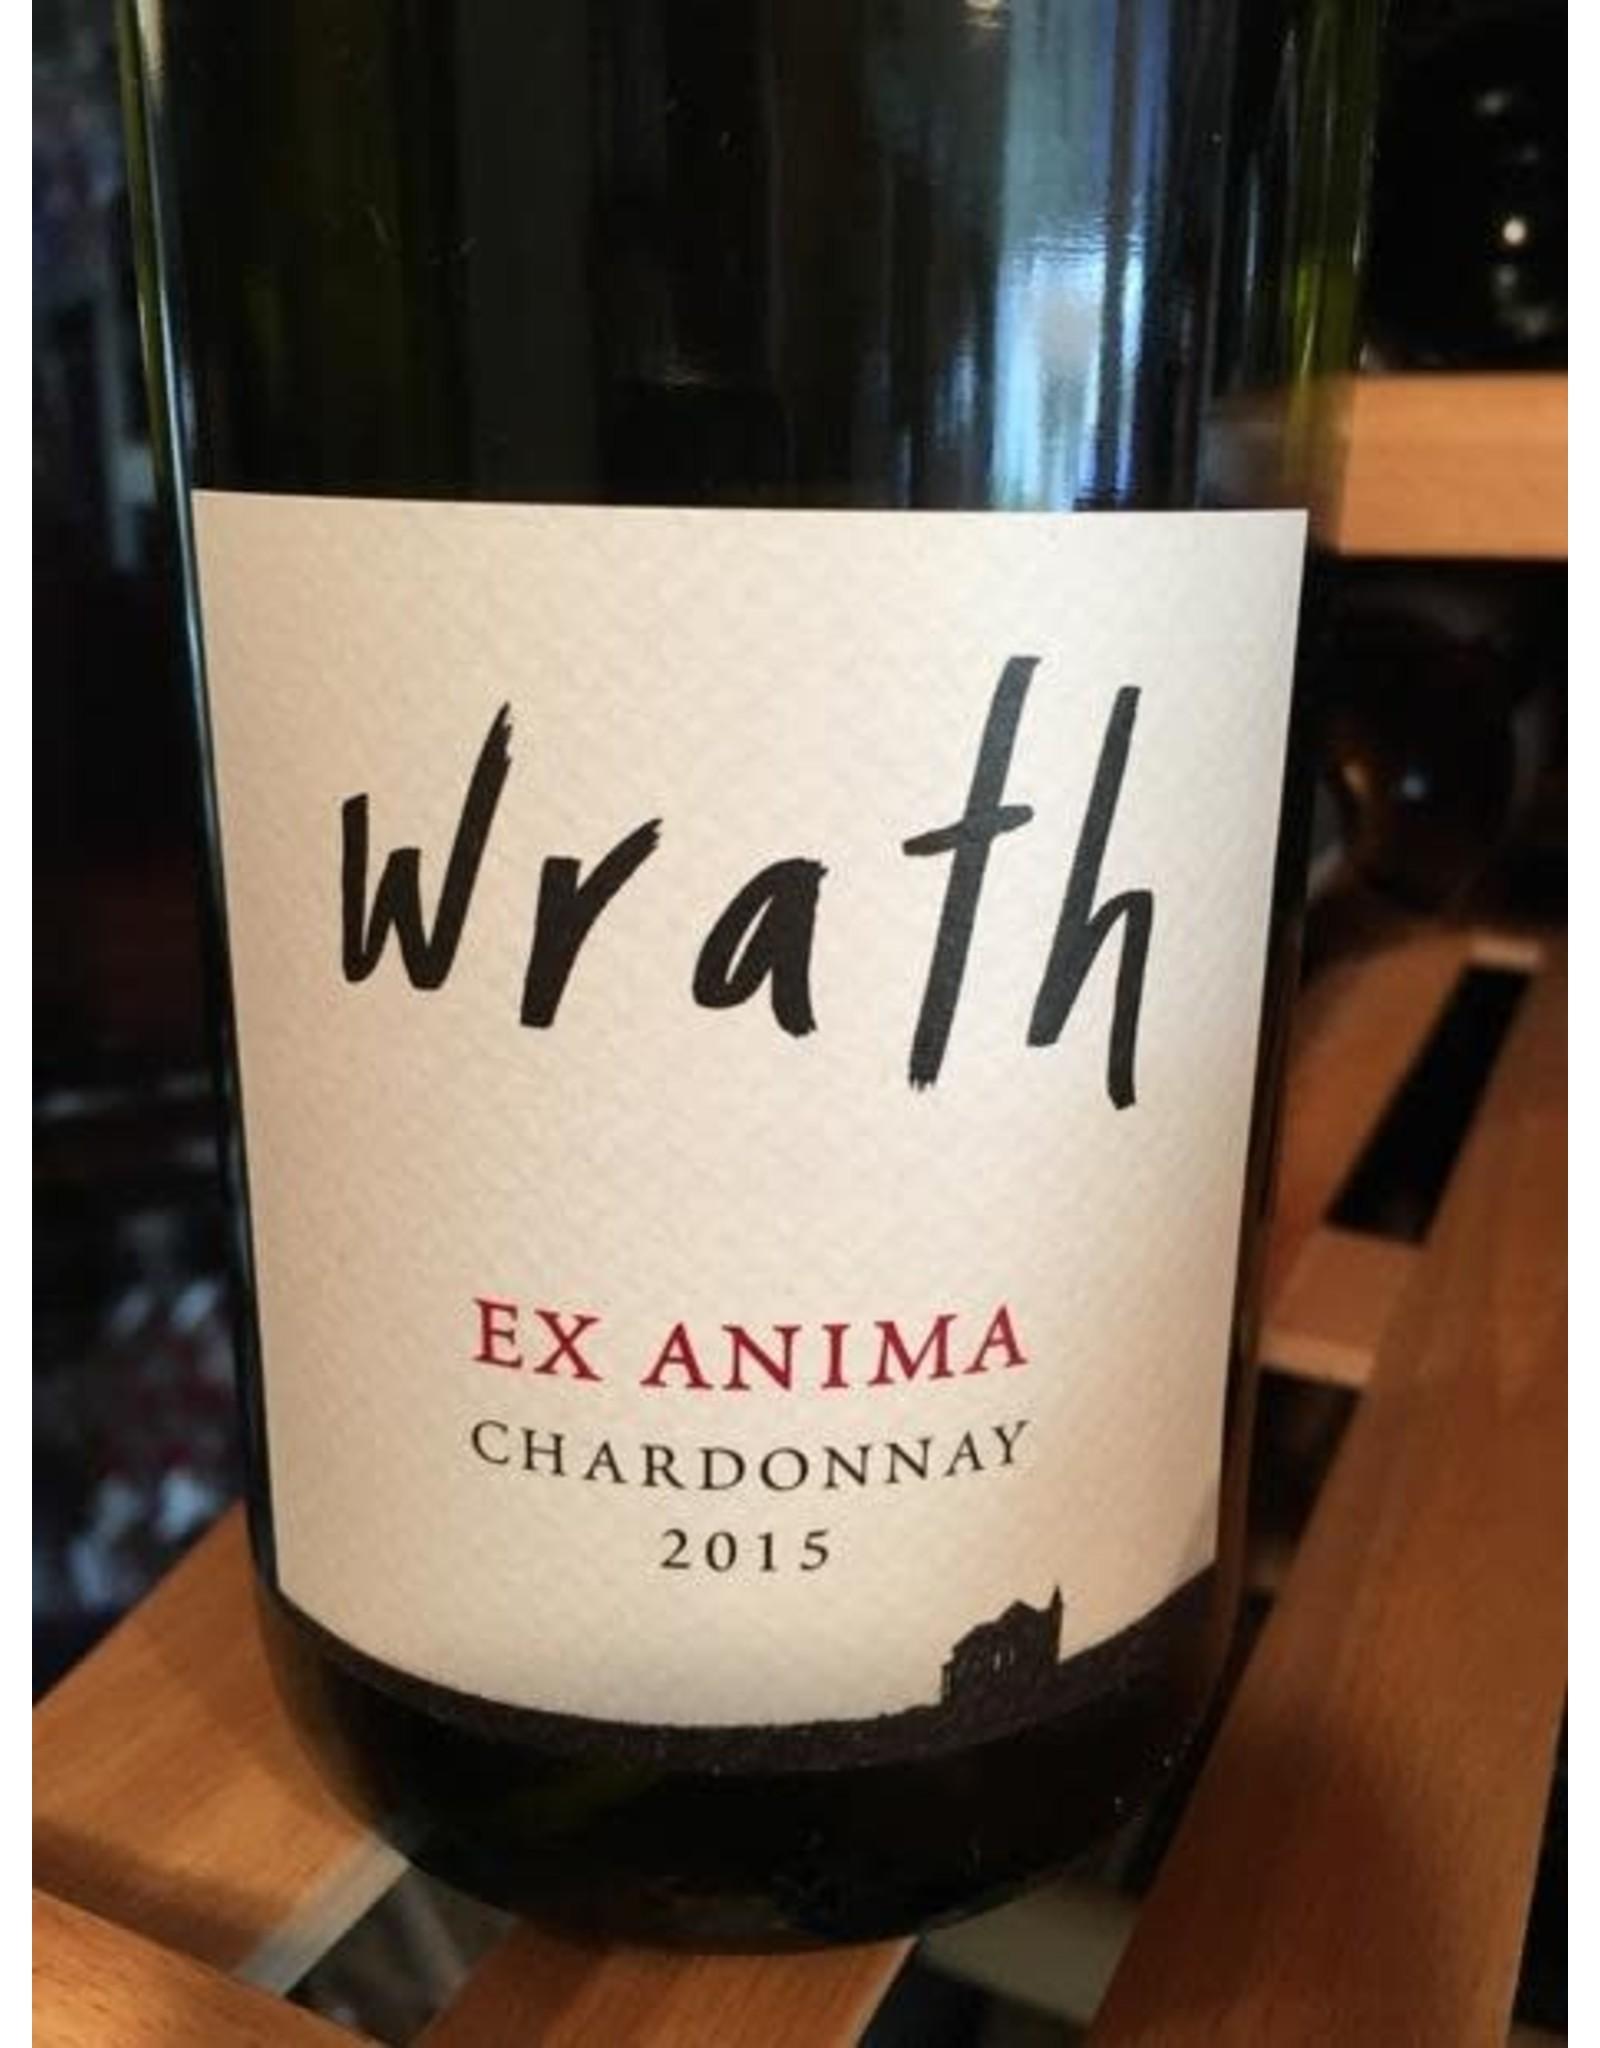 WRATH UNOAKED CHARDONNAY EX ANIMA 2015